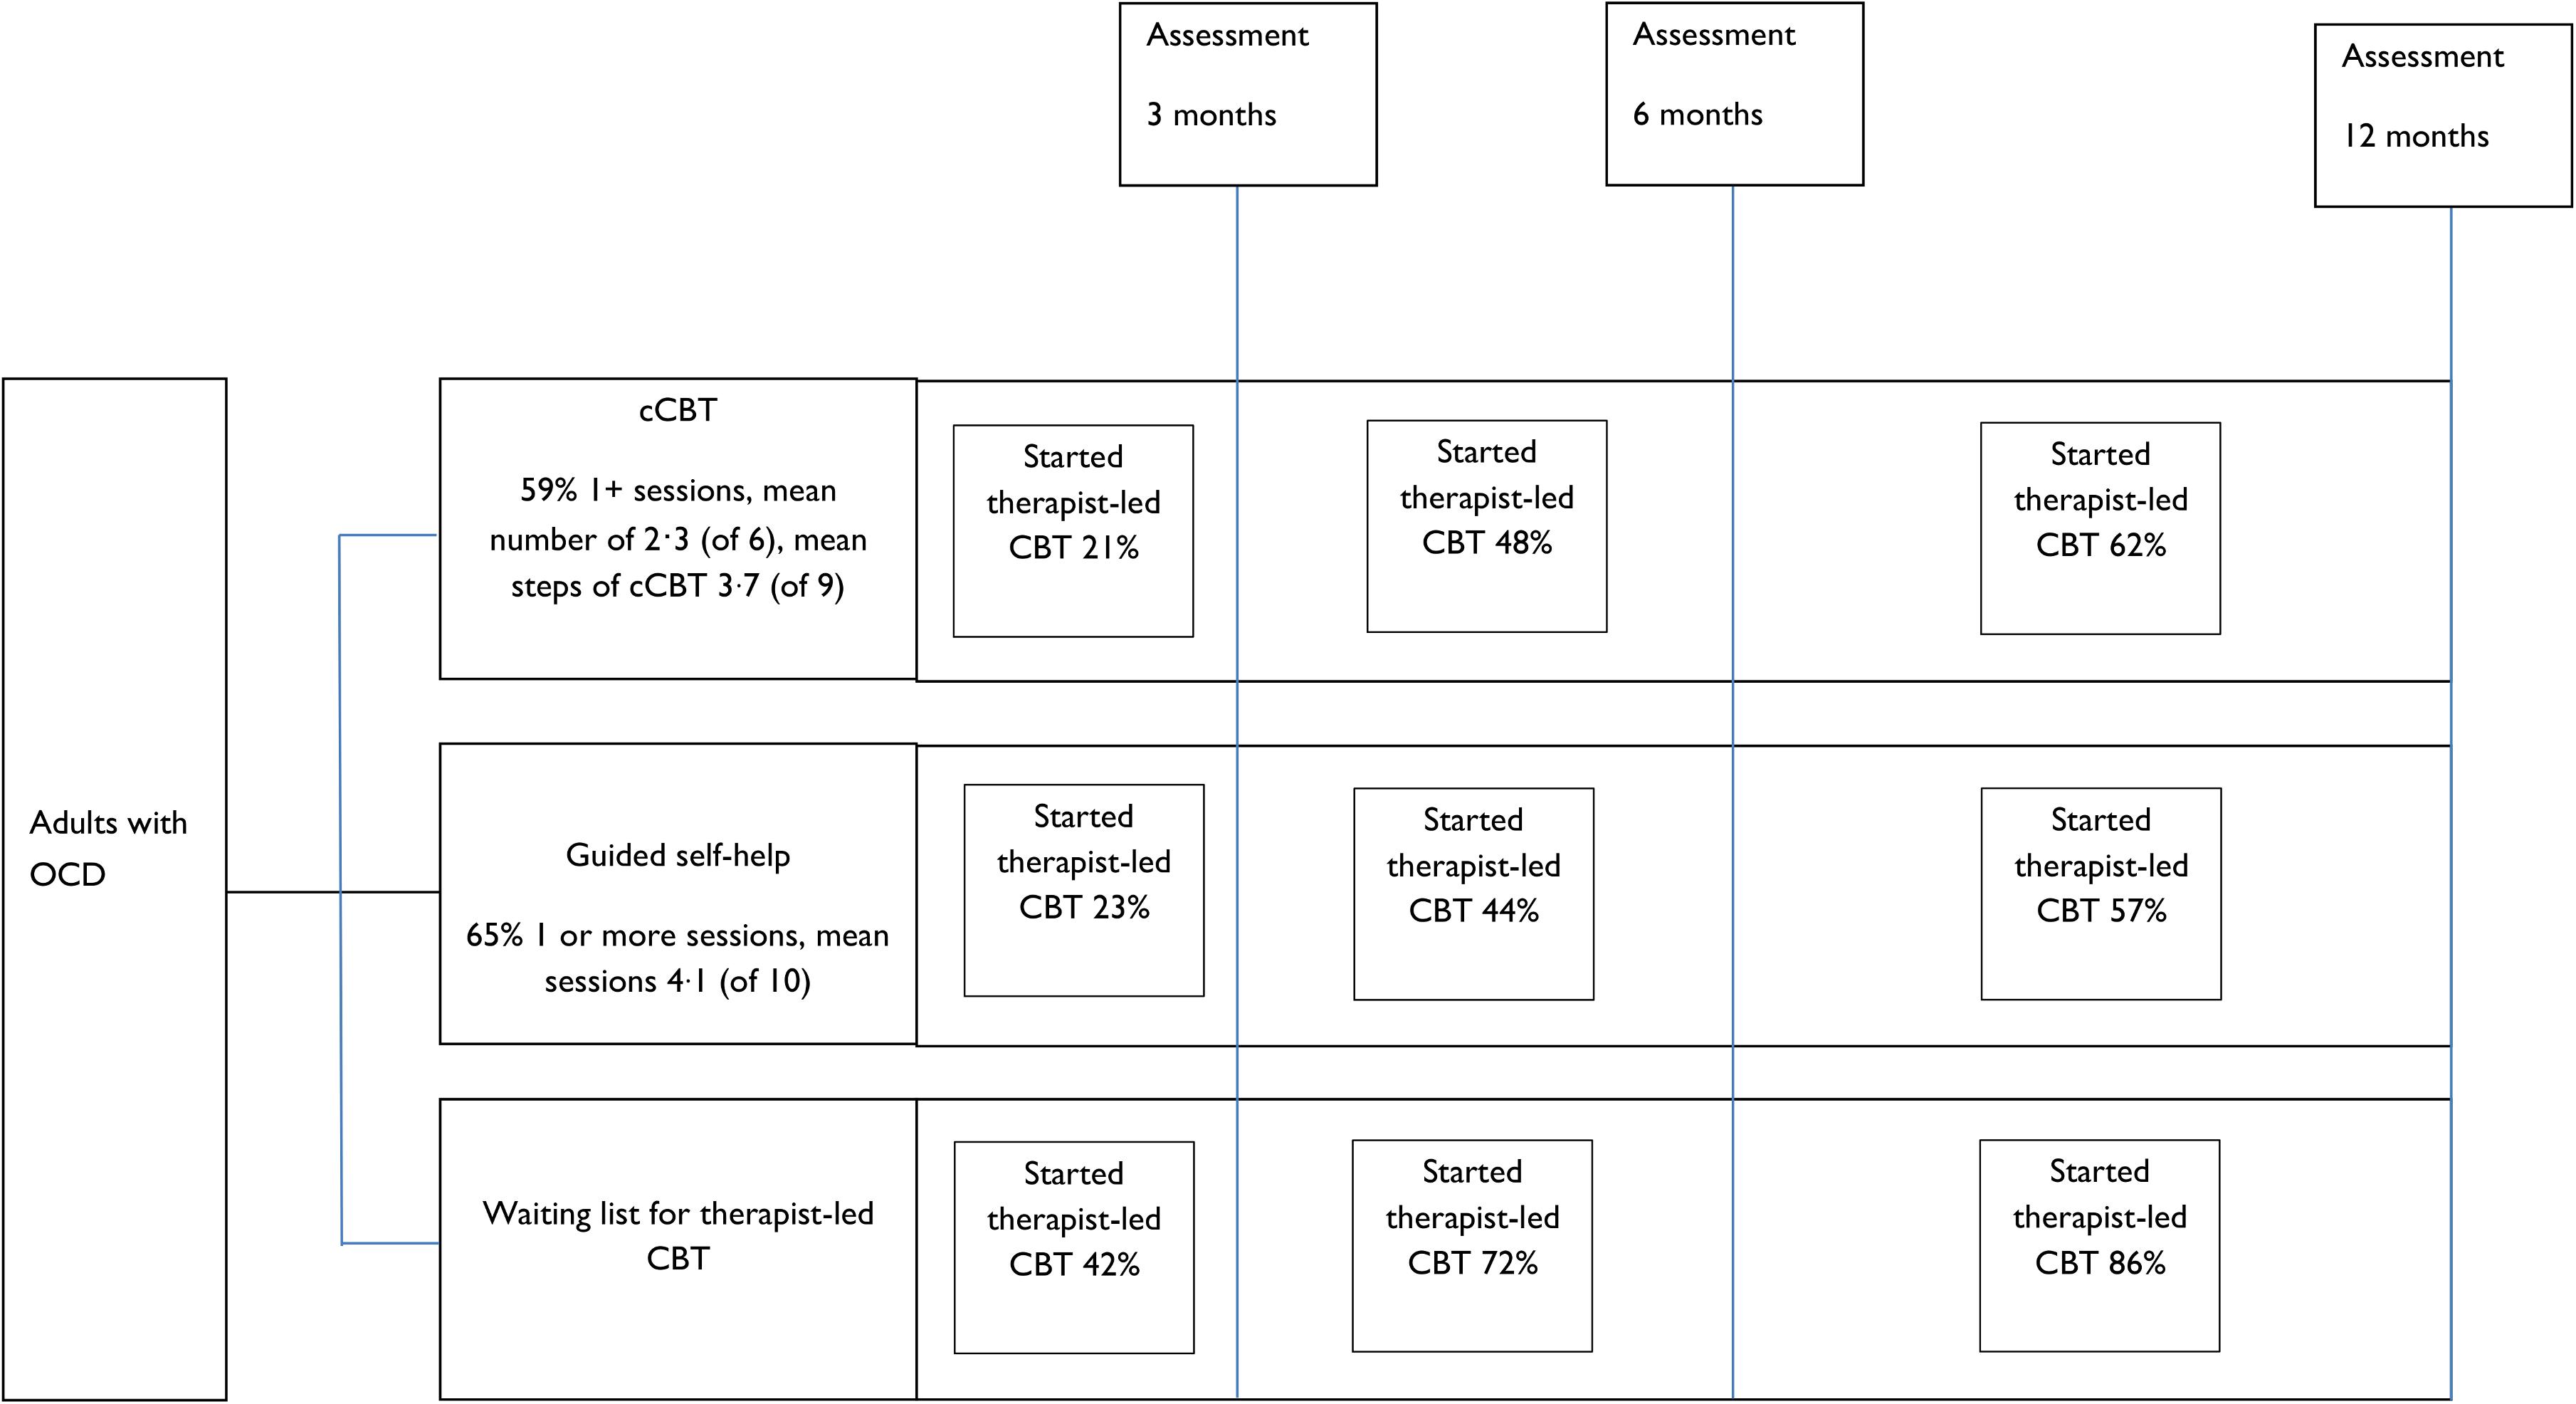 Flow chart illustrating therapist-led CBT uptake.